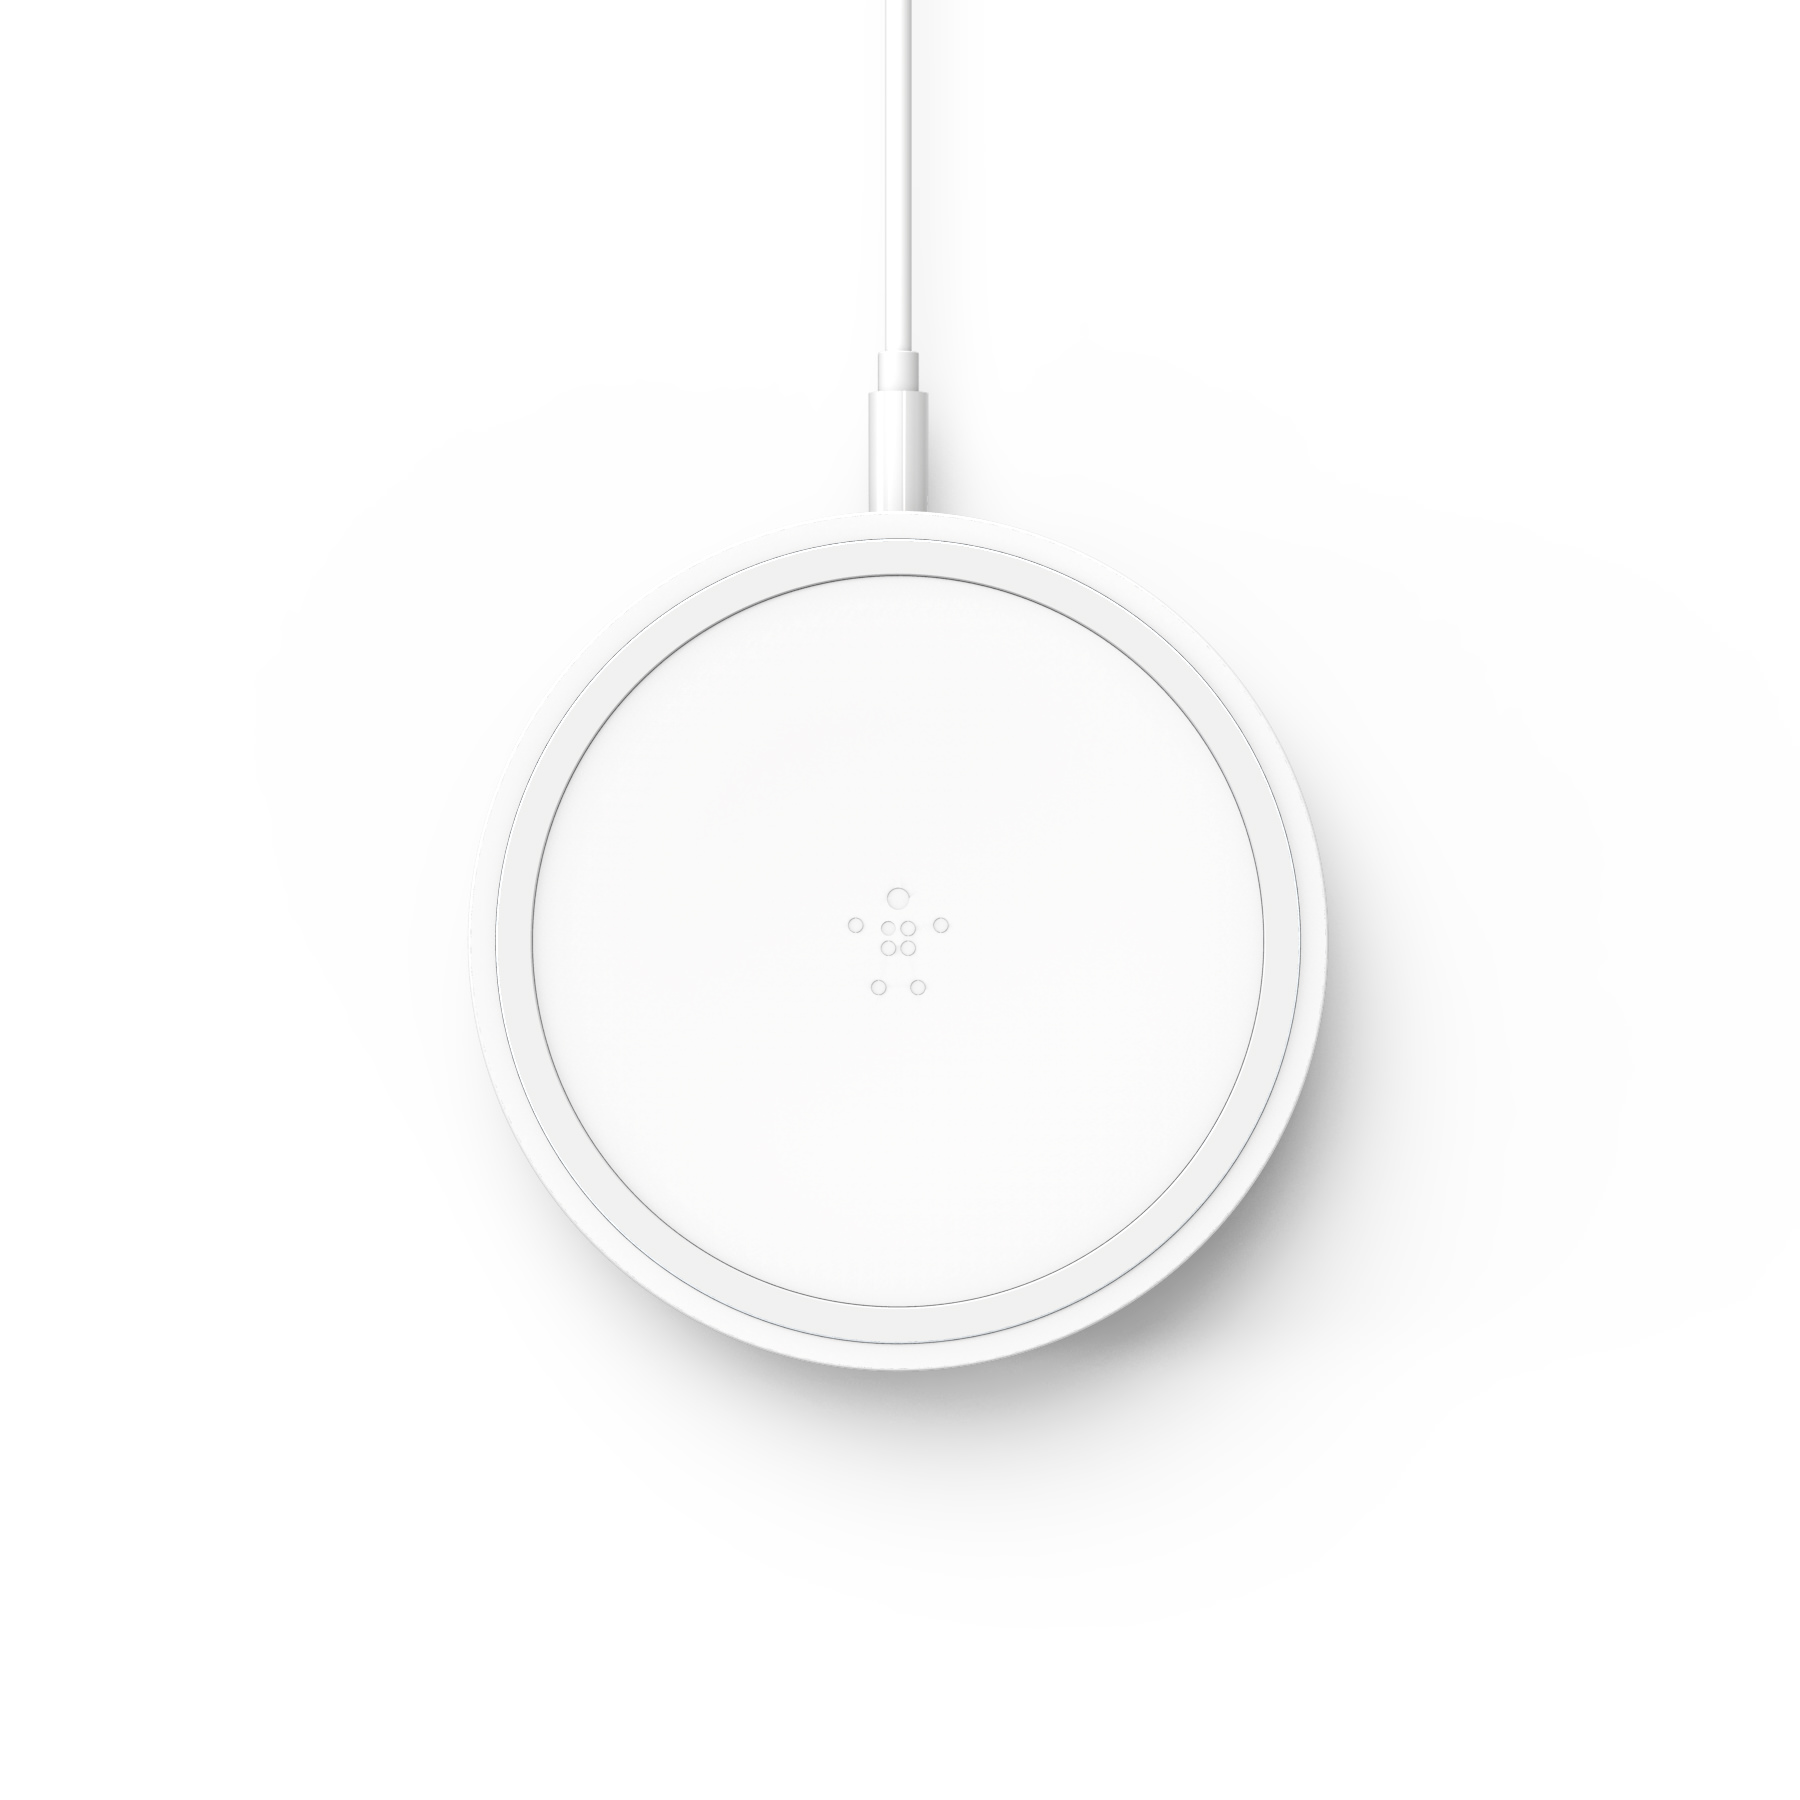 Bold_Charging_Pad_Product_2.jpg